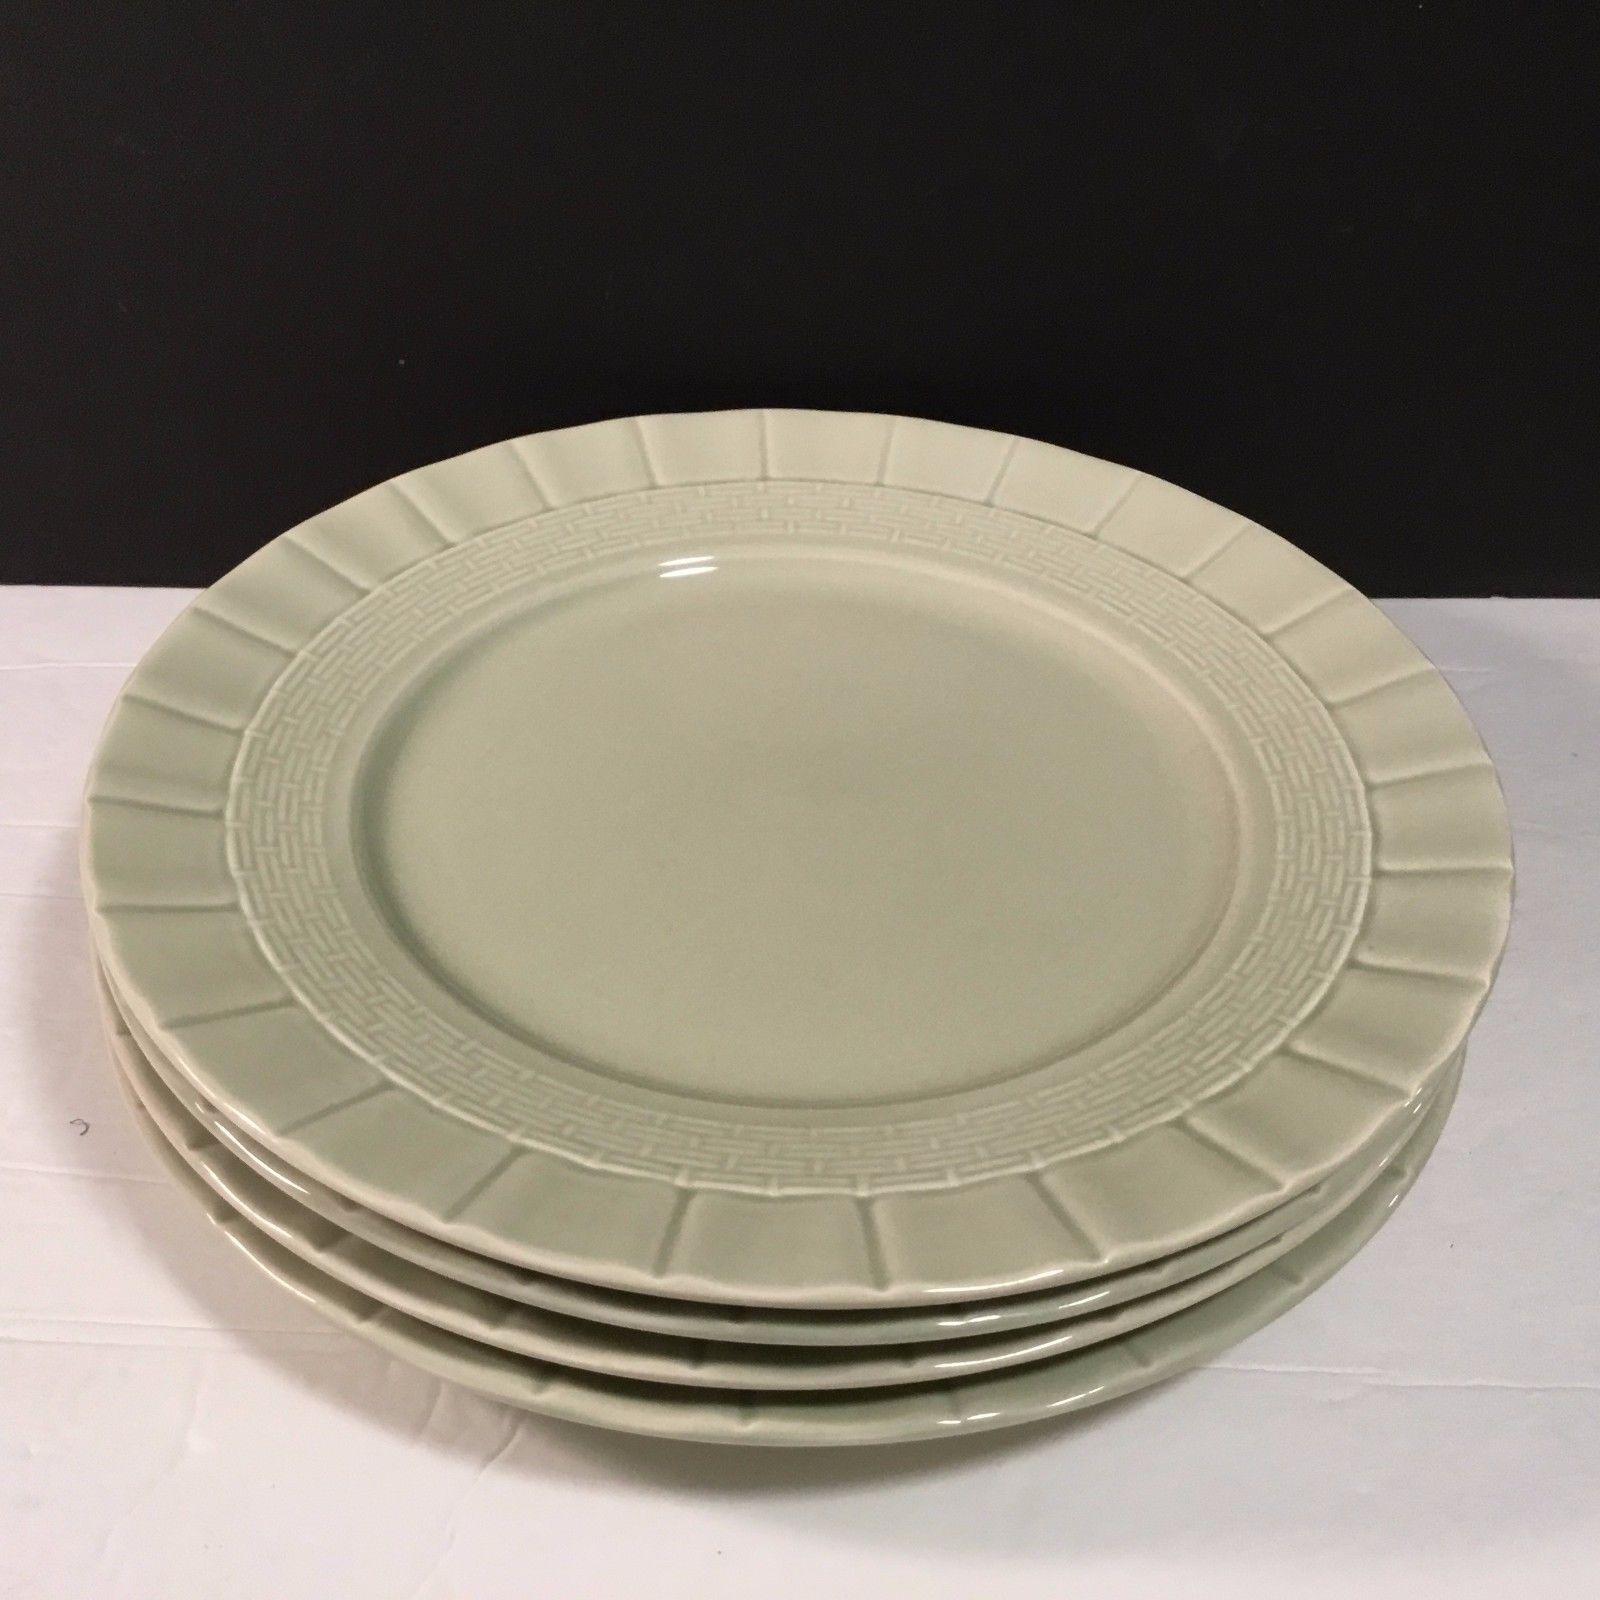 More Plates & Martha Stewart Plate: 13 listings